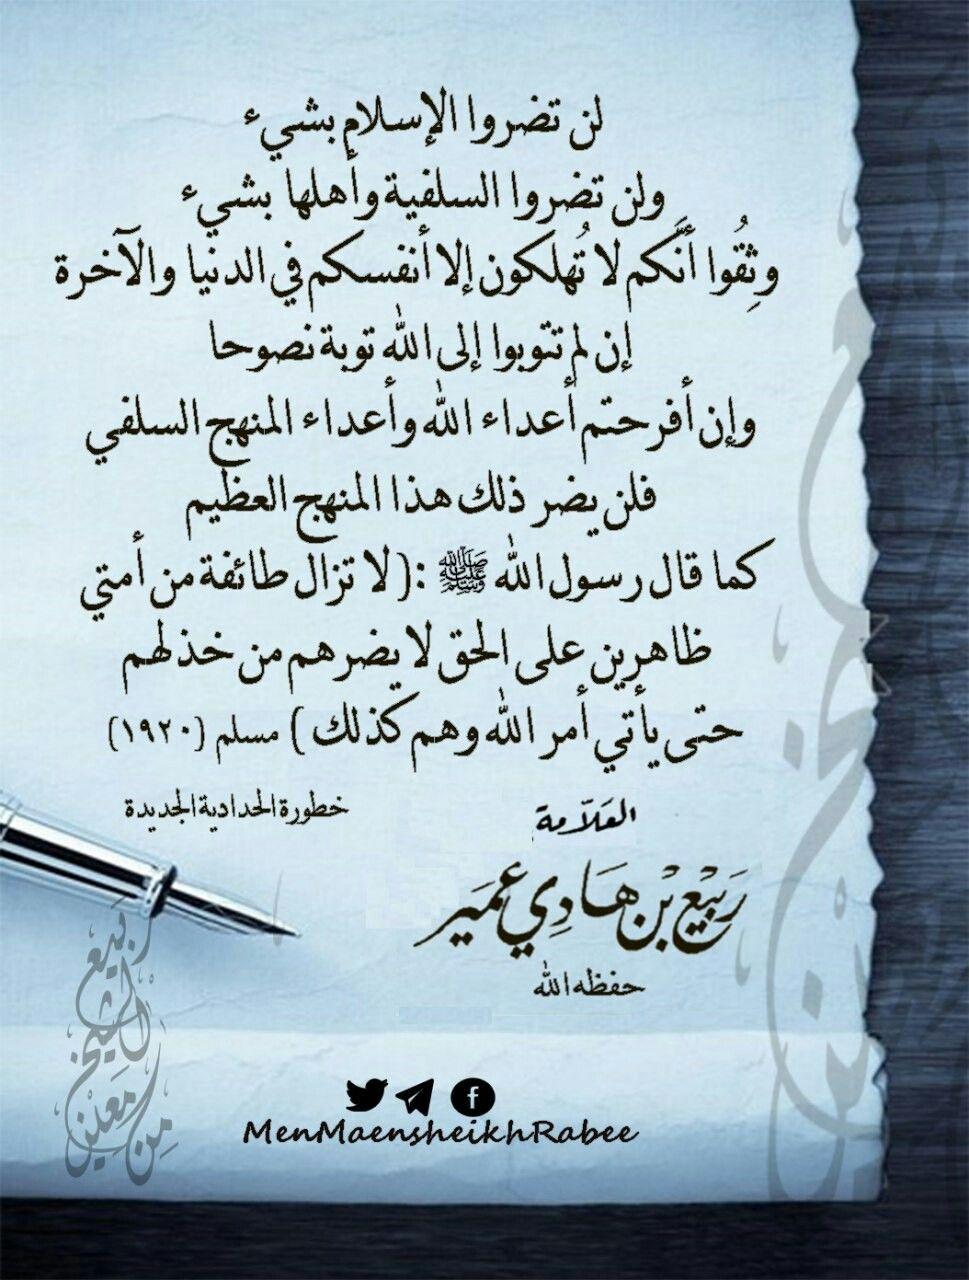 Pin By El Moubarki Hassan On العلامة ربيع بن هادي المدخلي In 2020 Math Math Equations Arabic Calligraphy